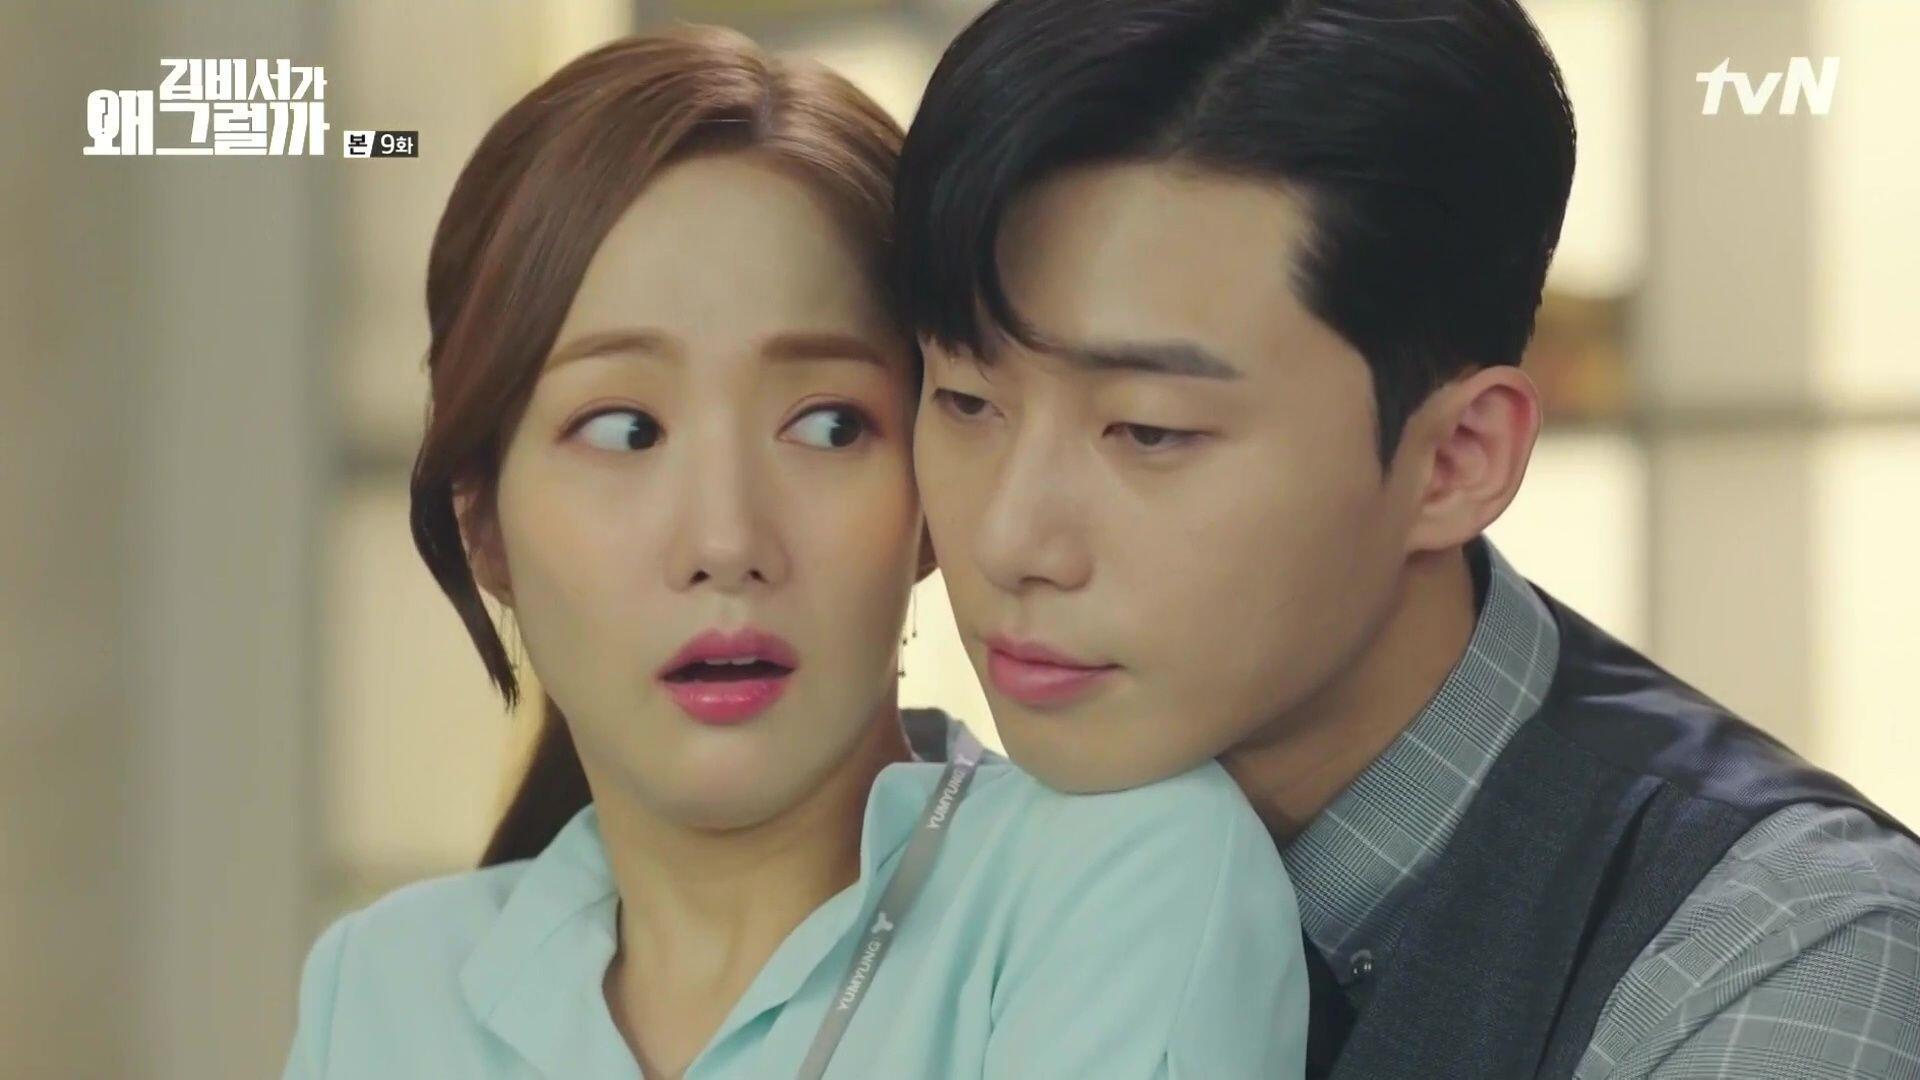 7 Pasangan Park Seo Joon dalam KDrama, Mana yang Paling Manis?